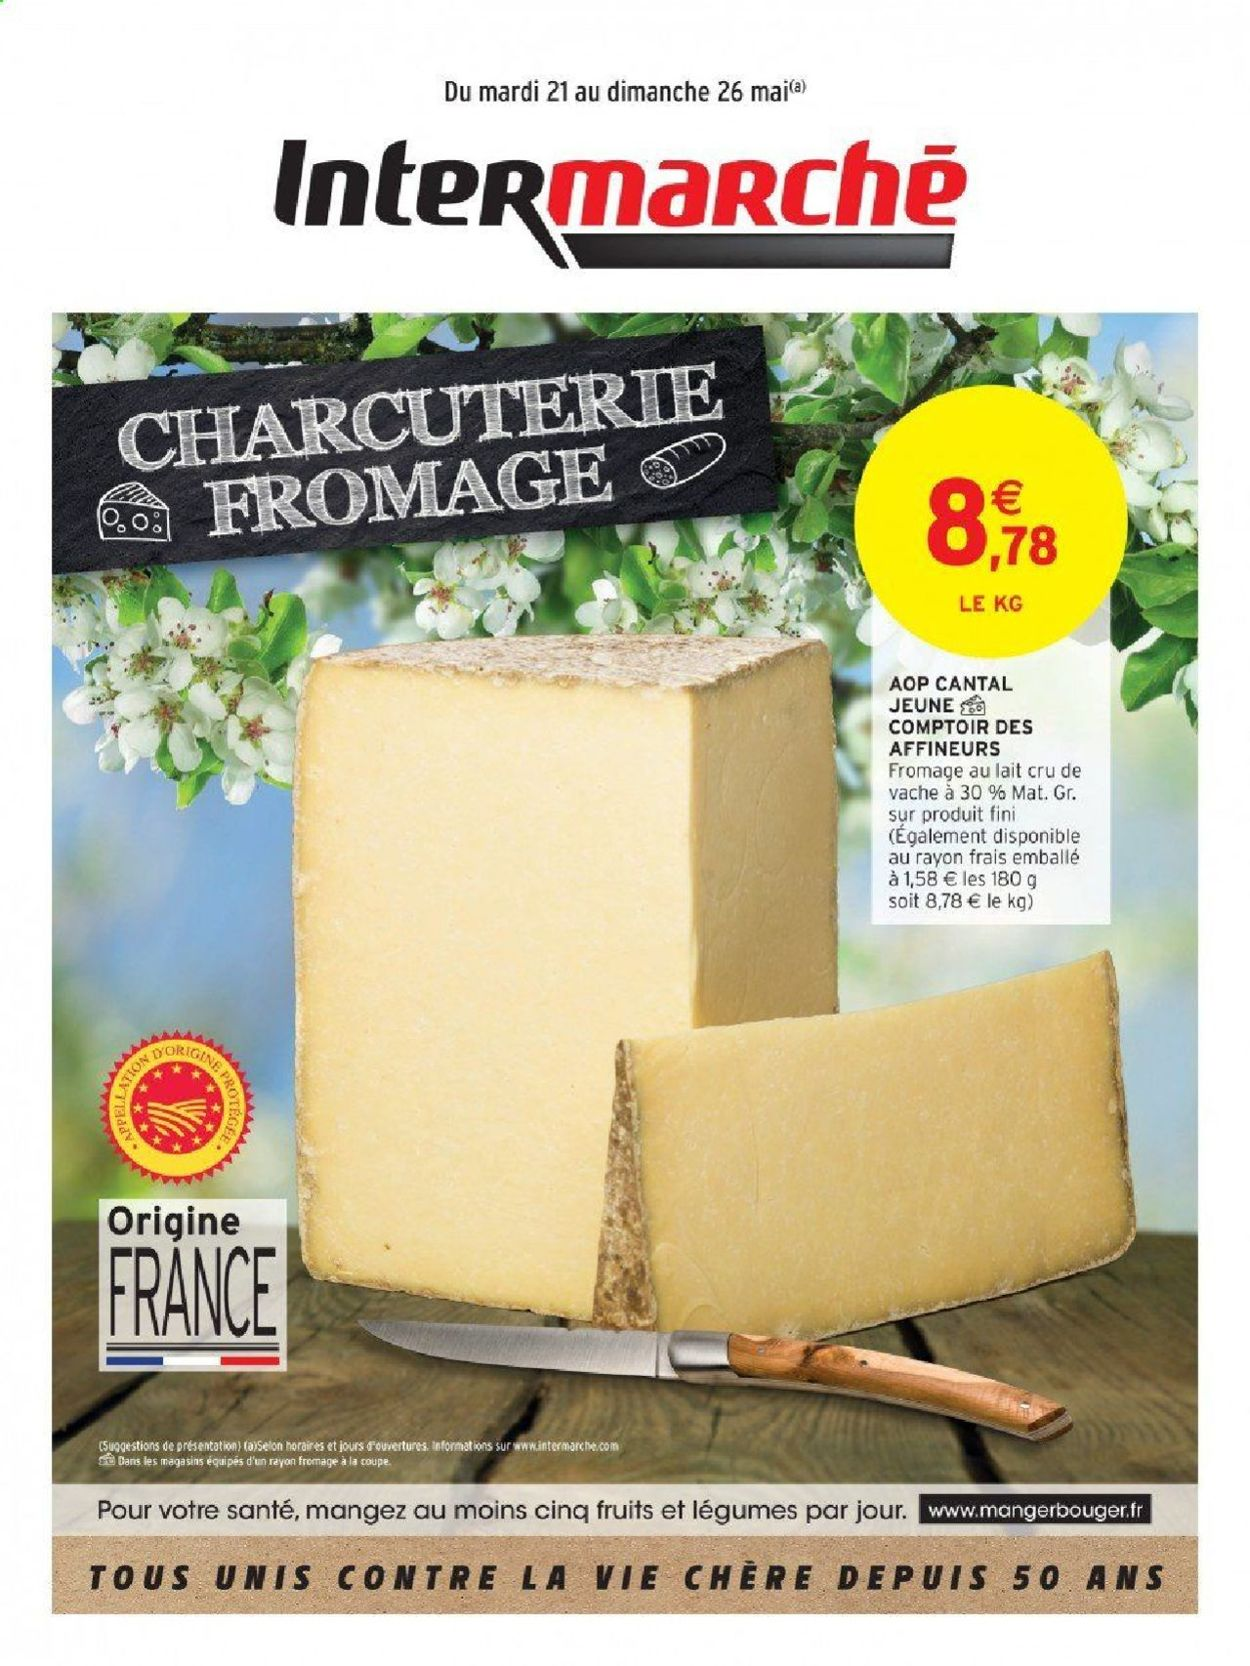 Intermarché Catalogue - 21.05-26.05.2019